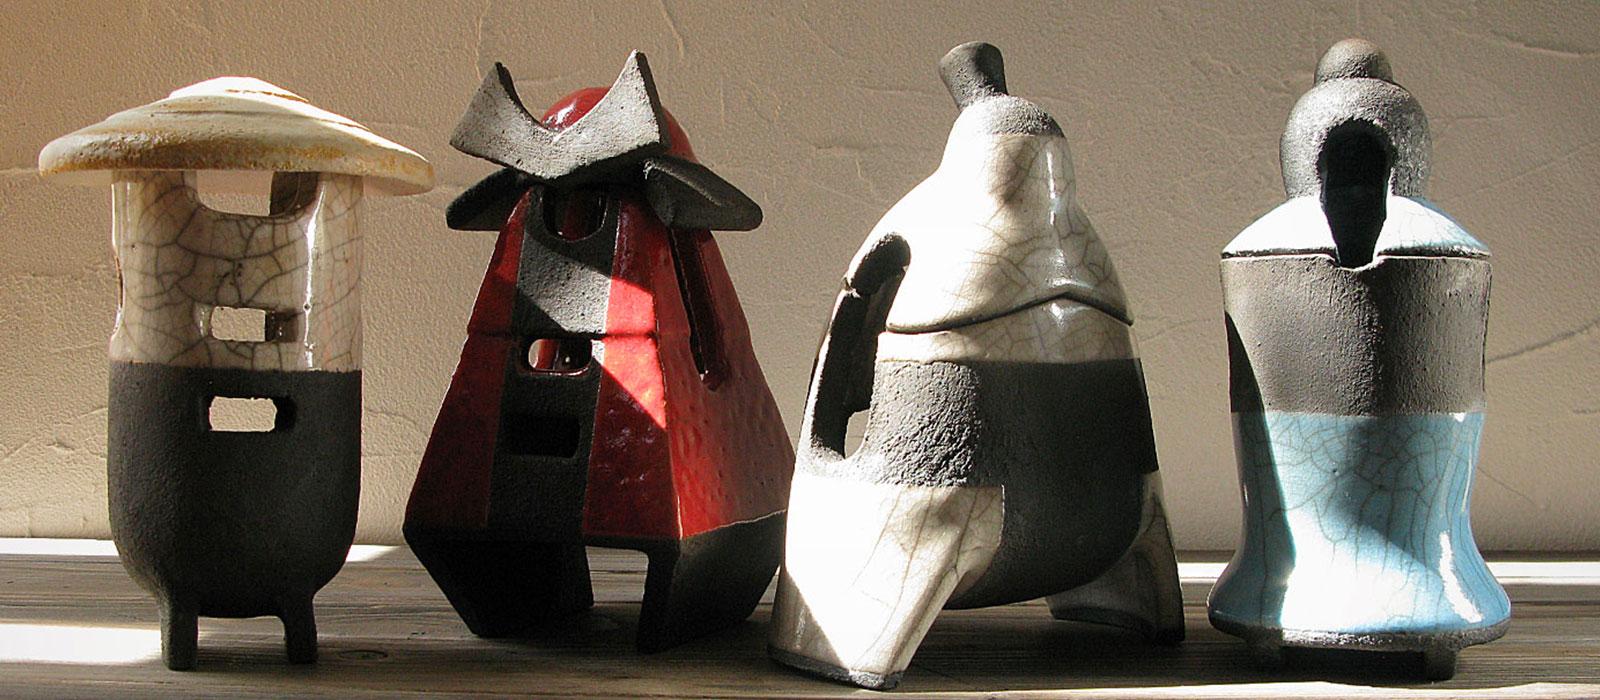 immagine background raku ceramic collection Dgsign Pottery